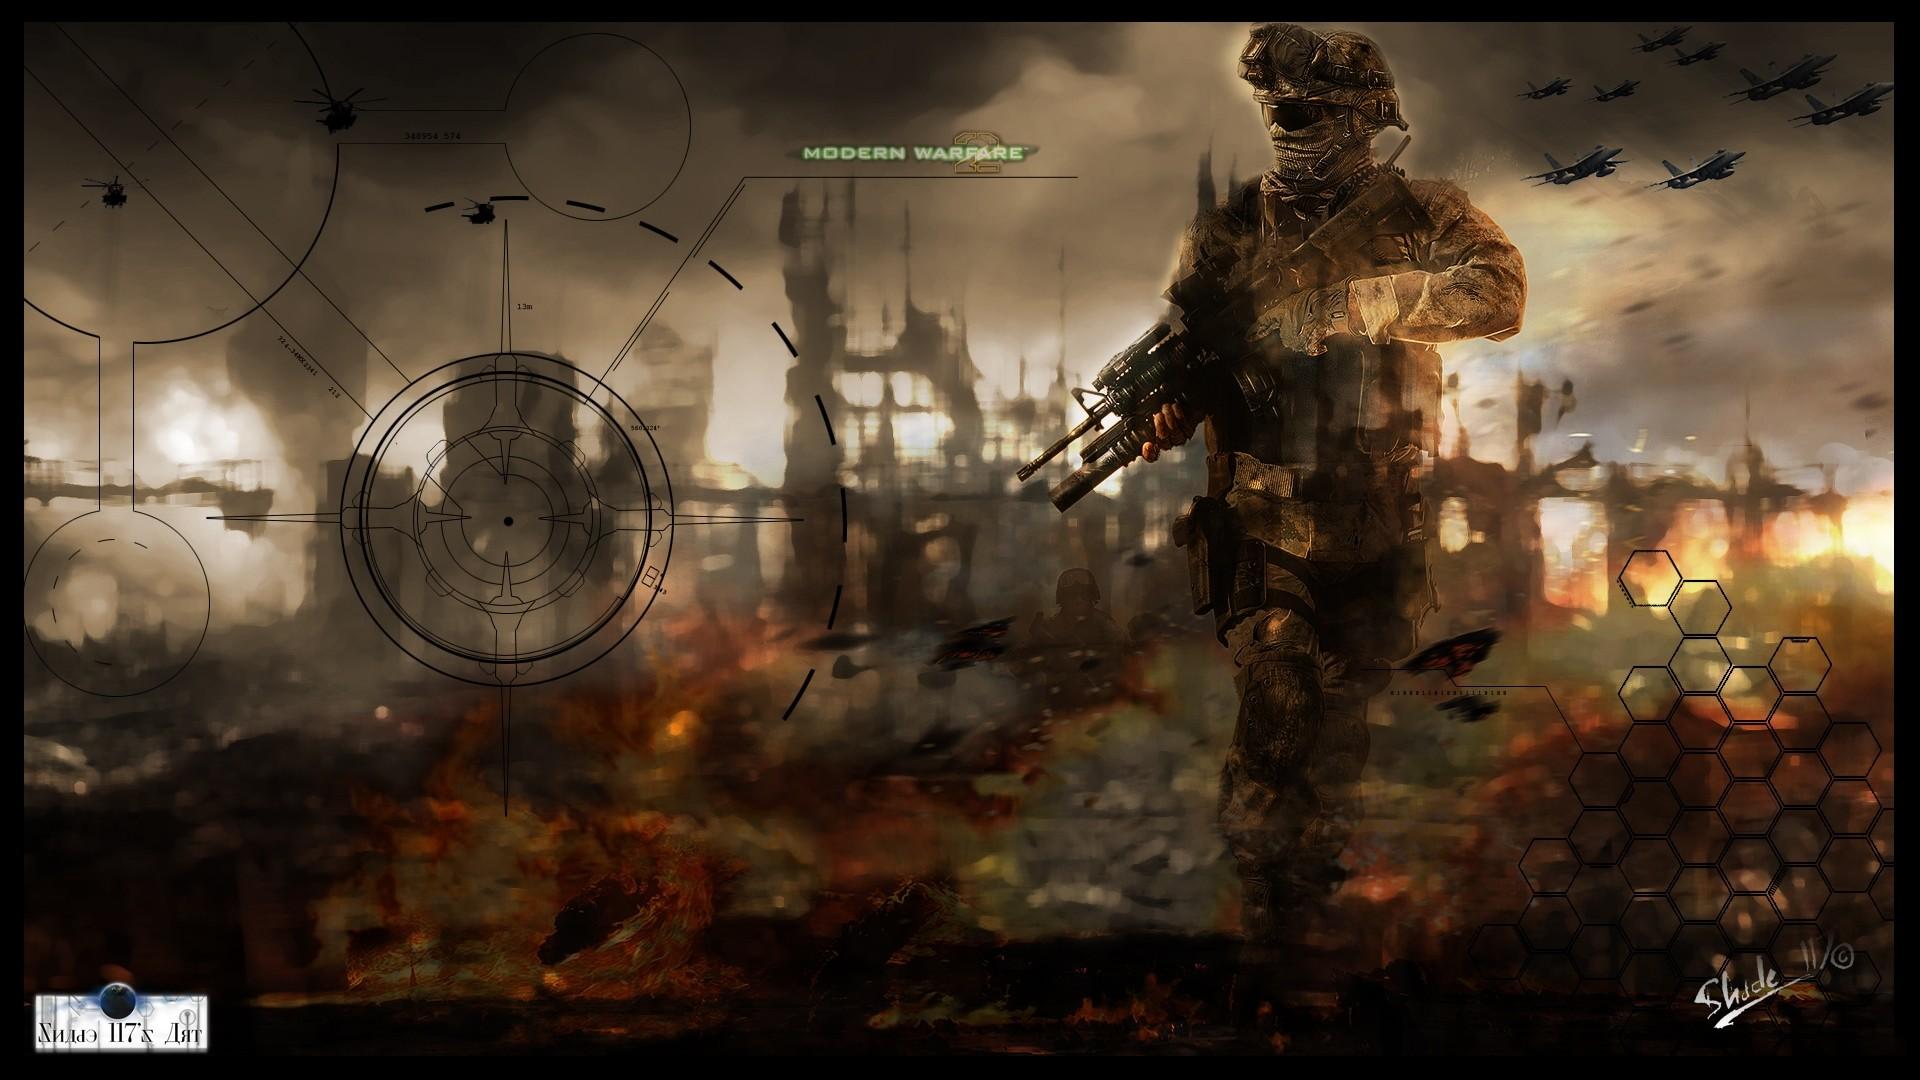 1920x1080 Wallpaper Call Of Duty Modern Warfare 2 Soldier Gun Fighters